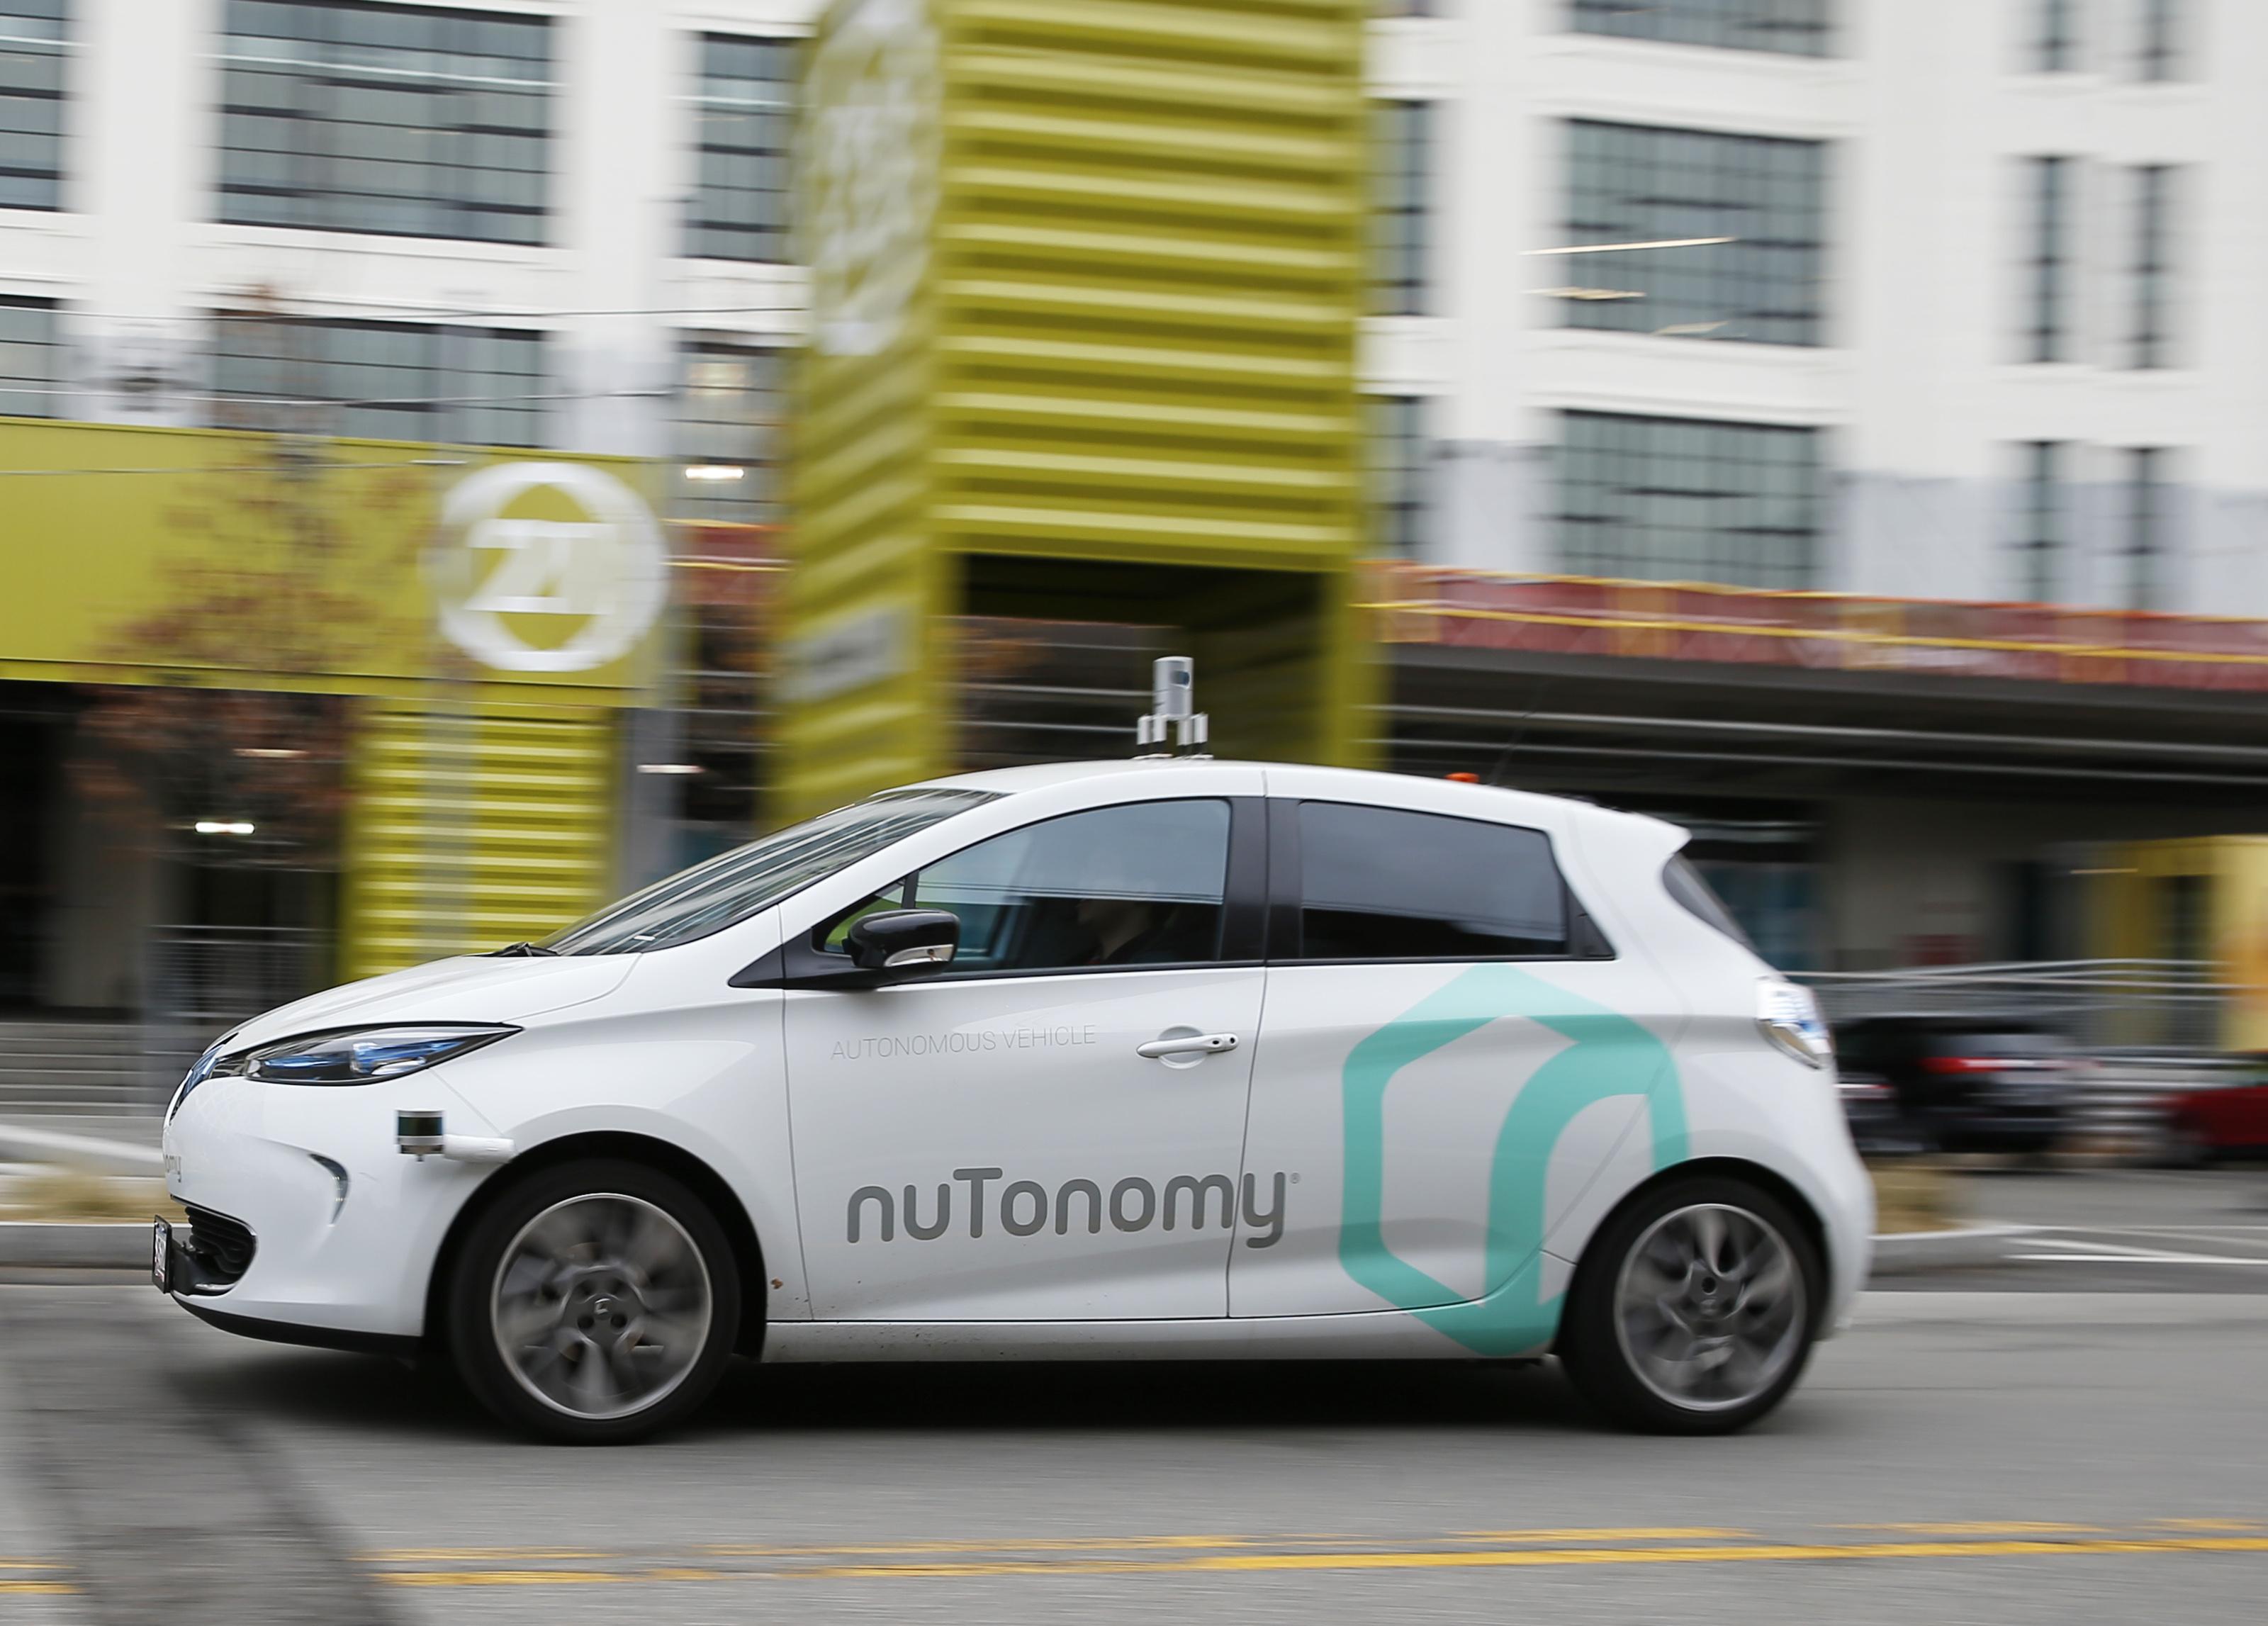 First Driverless Car In Boston